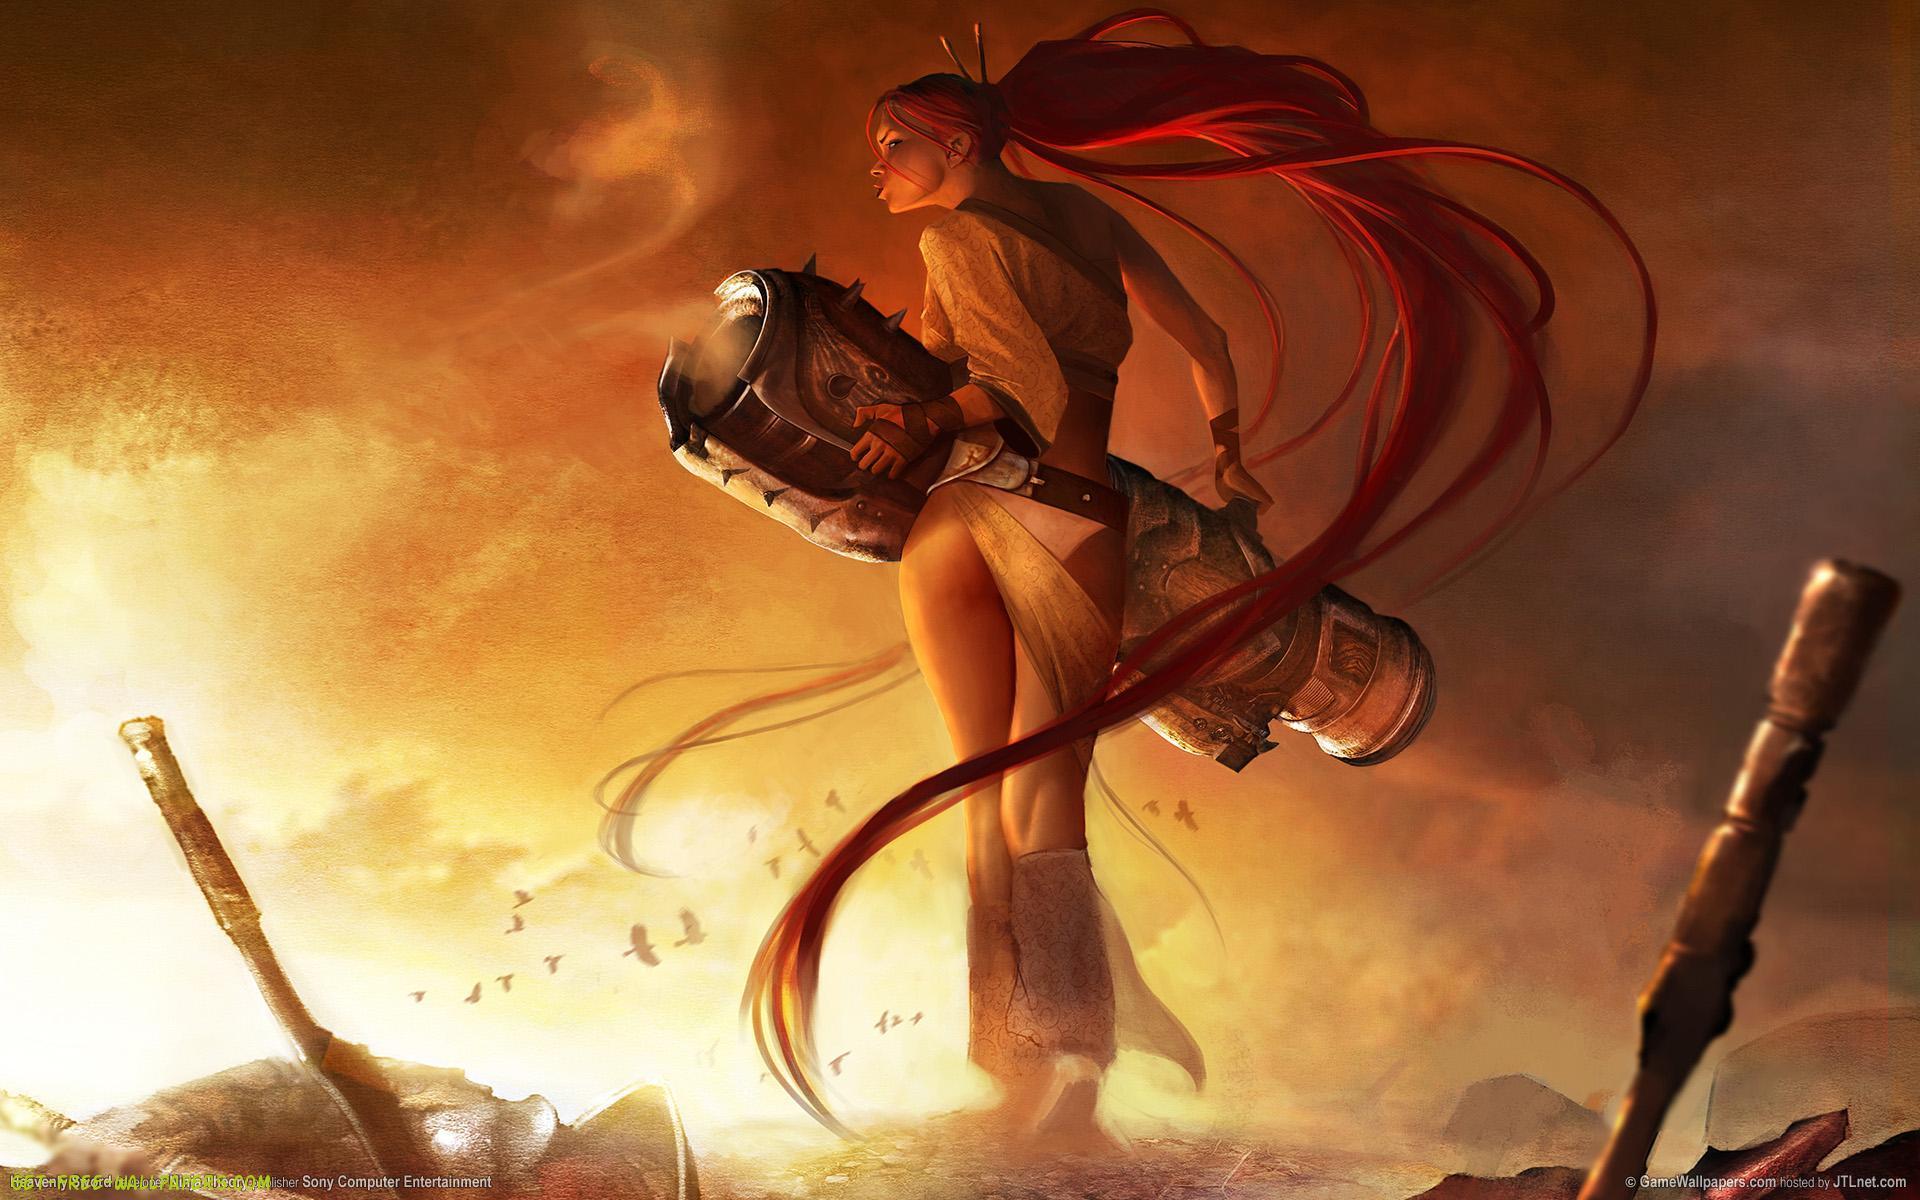 Heavenly Sword All Cutscenes (Game Movie) 1080p - YouTube